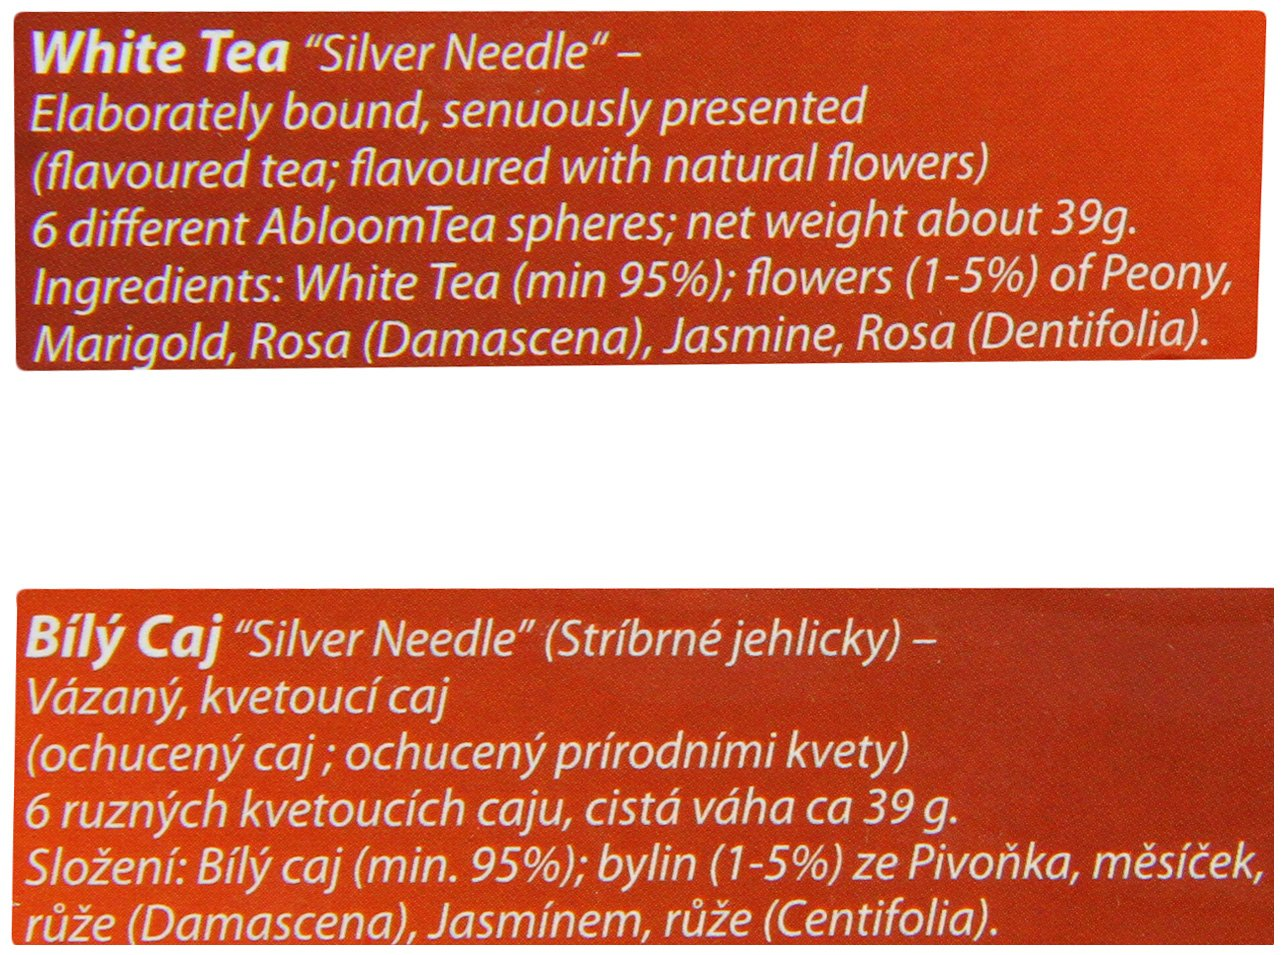 Creano-Teeblumen-Mix-Geschenkset-ErblhTee-mit-Glaskanne-Weitee-6-verschiedene-Sorten